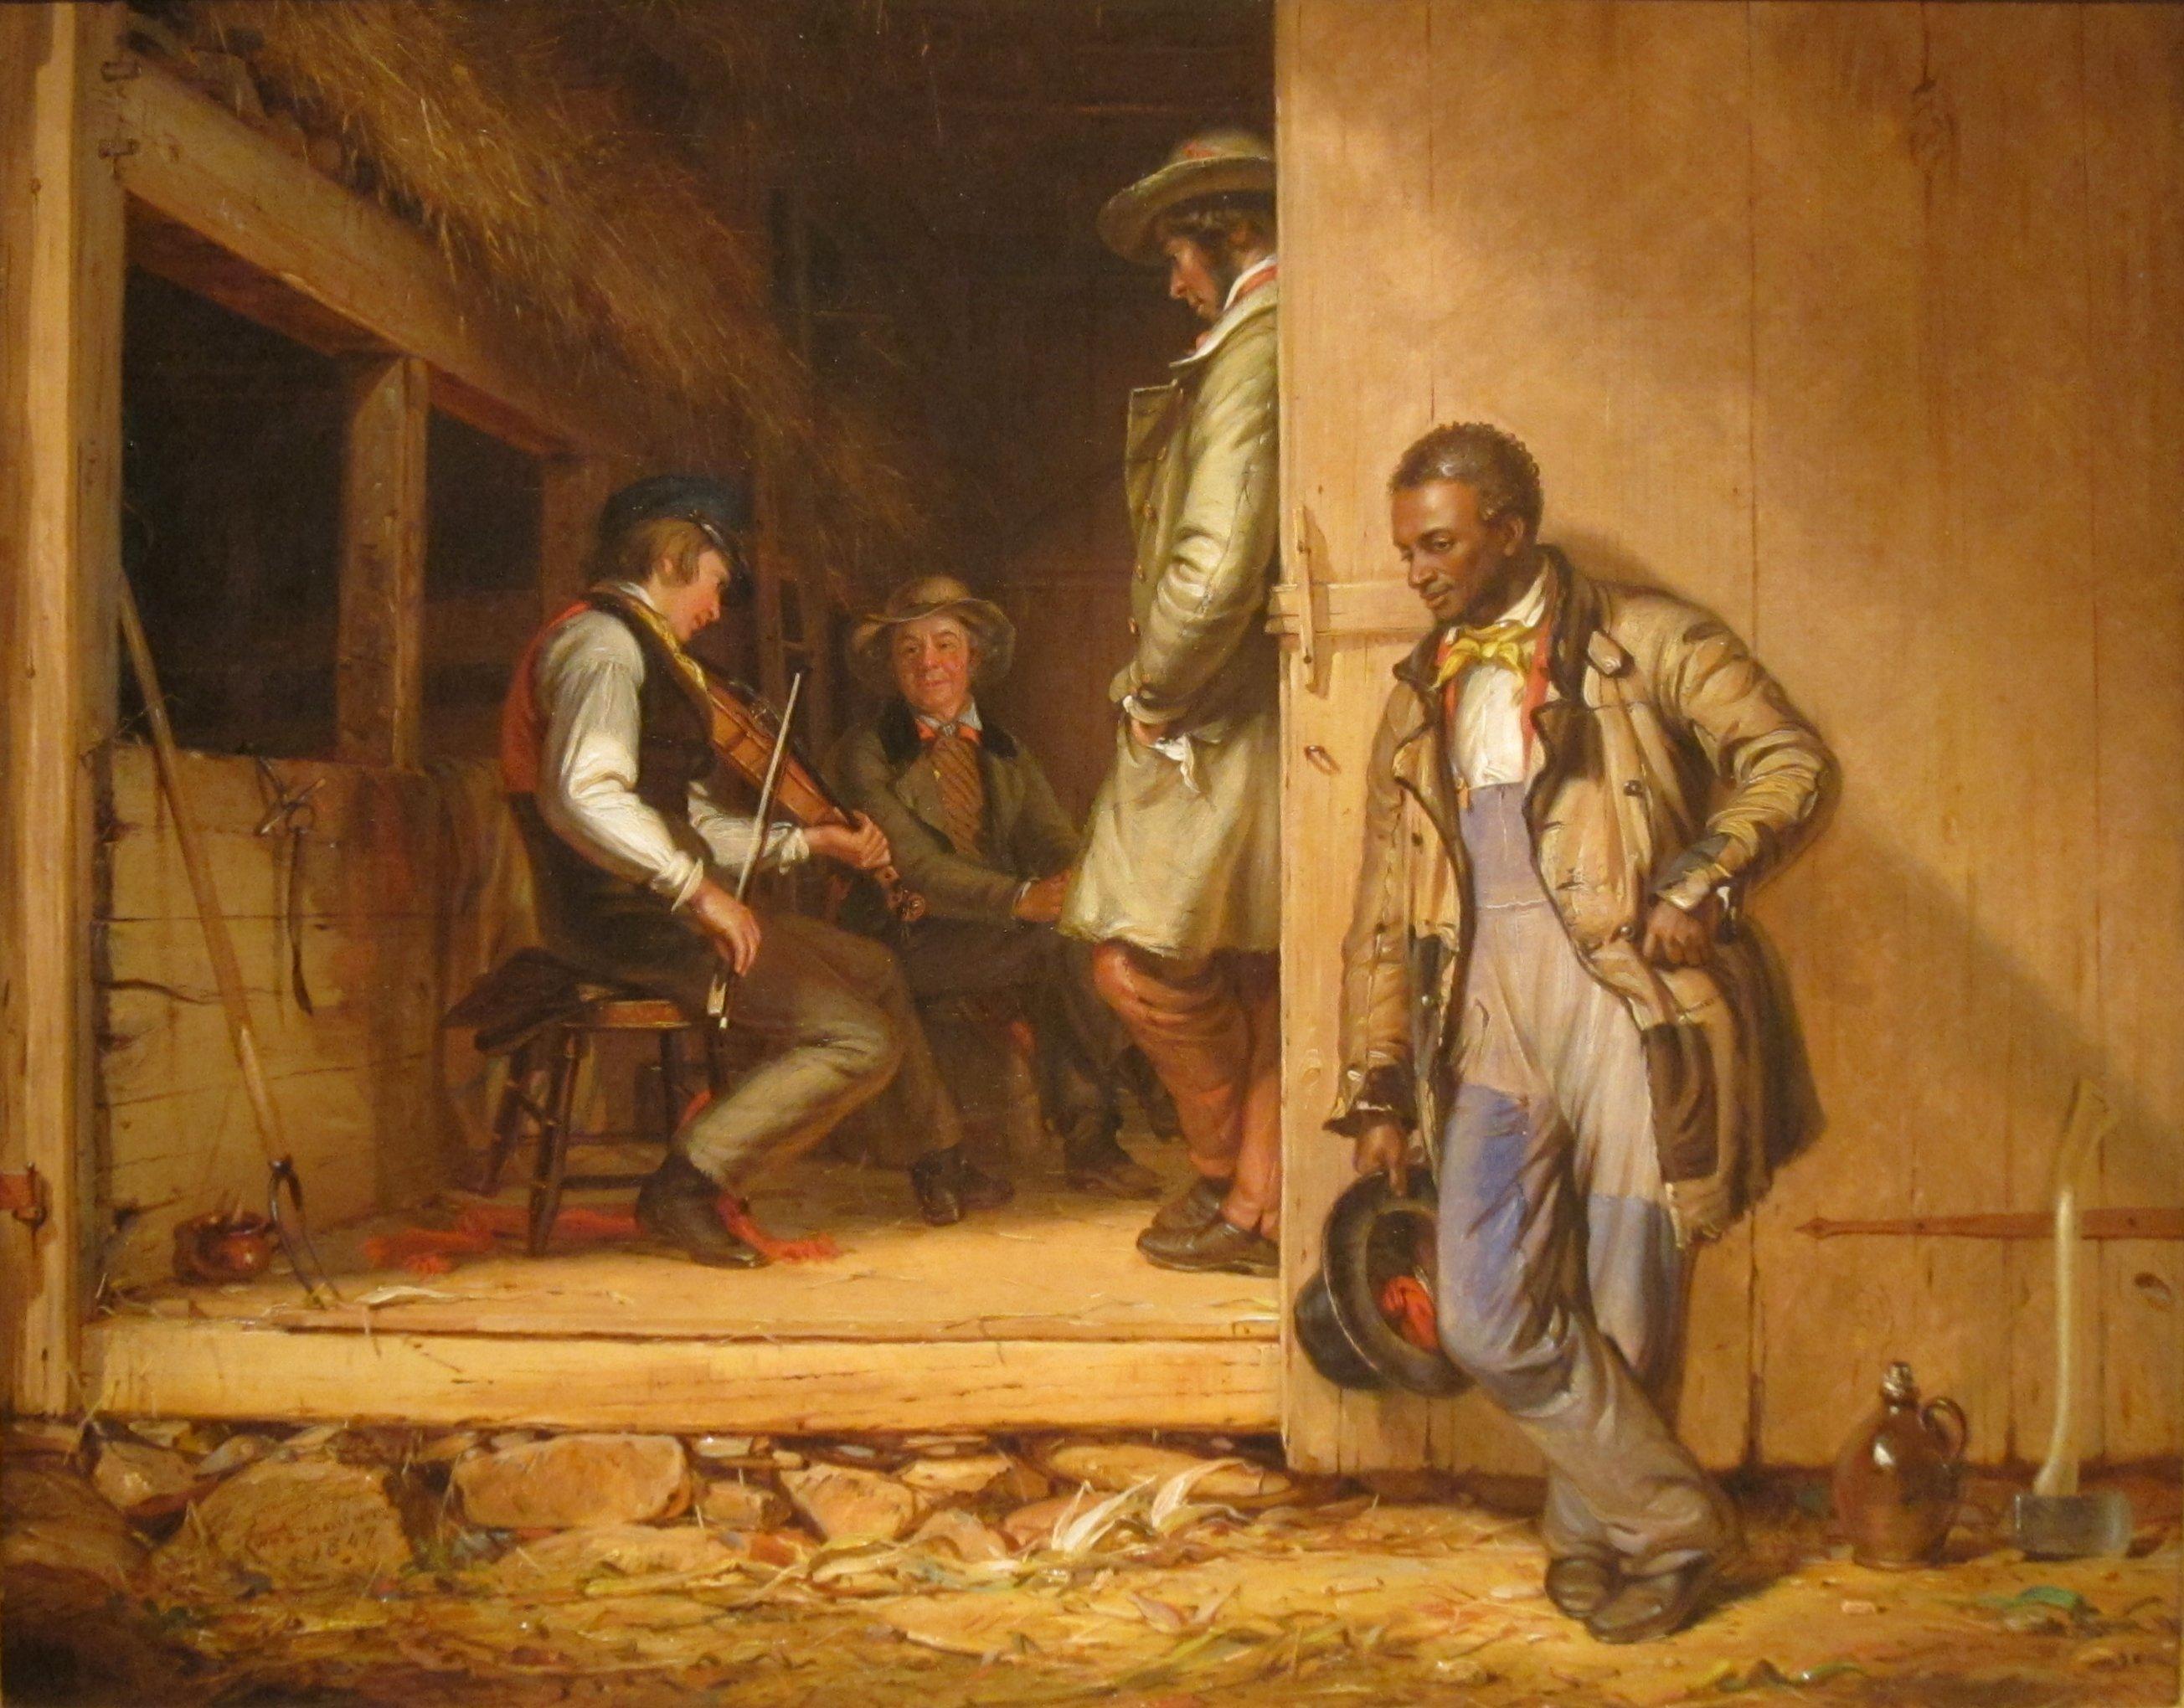 FileThe Power of Music by William Sidney Mount 1847JPG